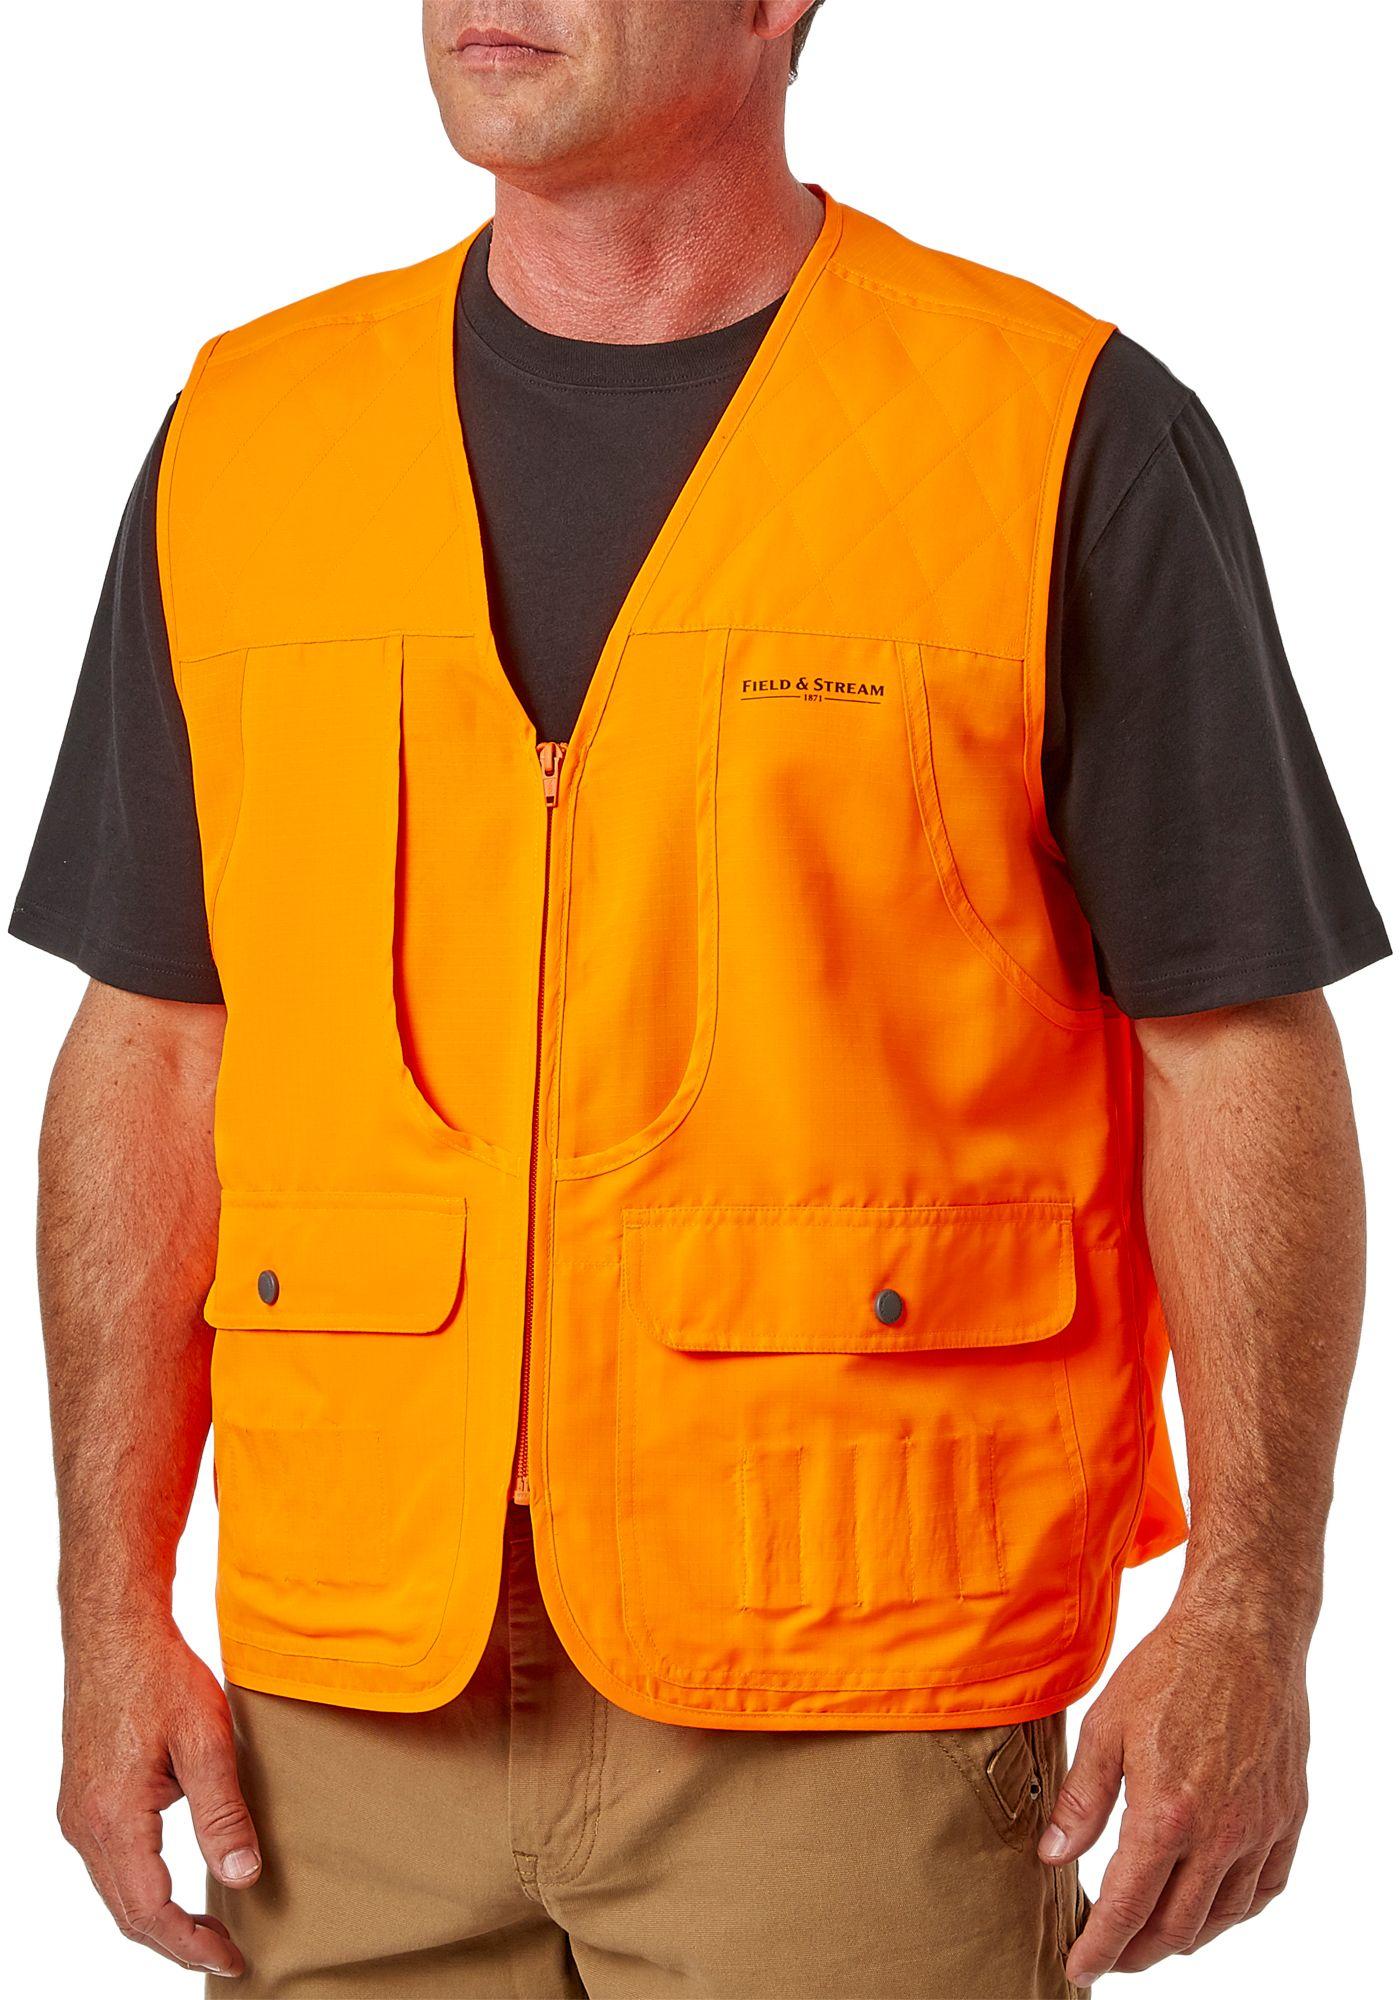 Field & Stream Men's Blaze Orange Front Loader Hunting Vest